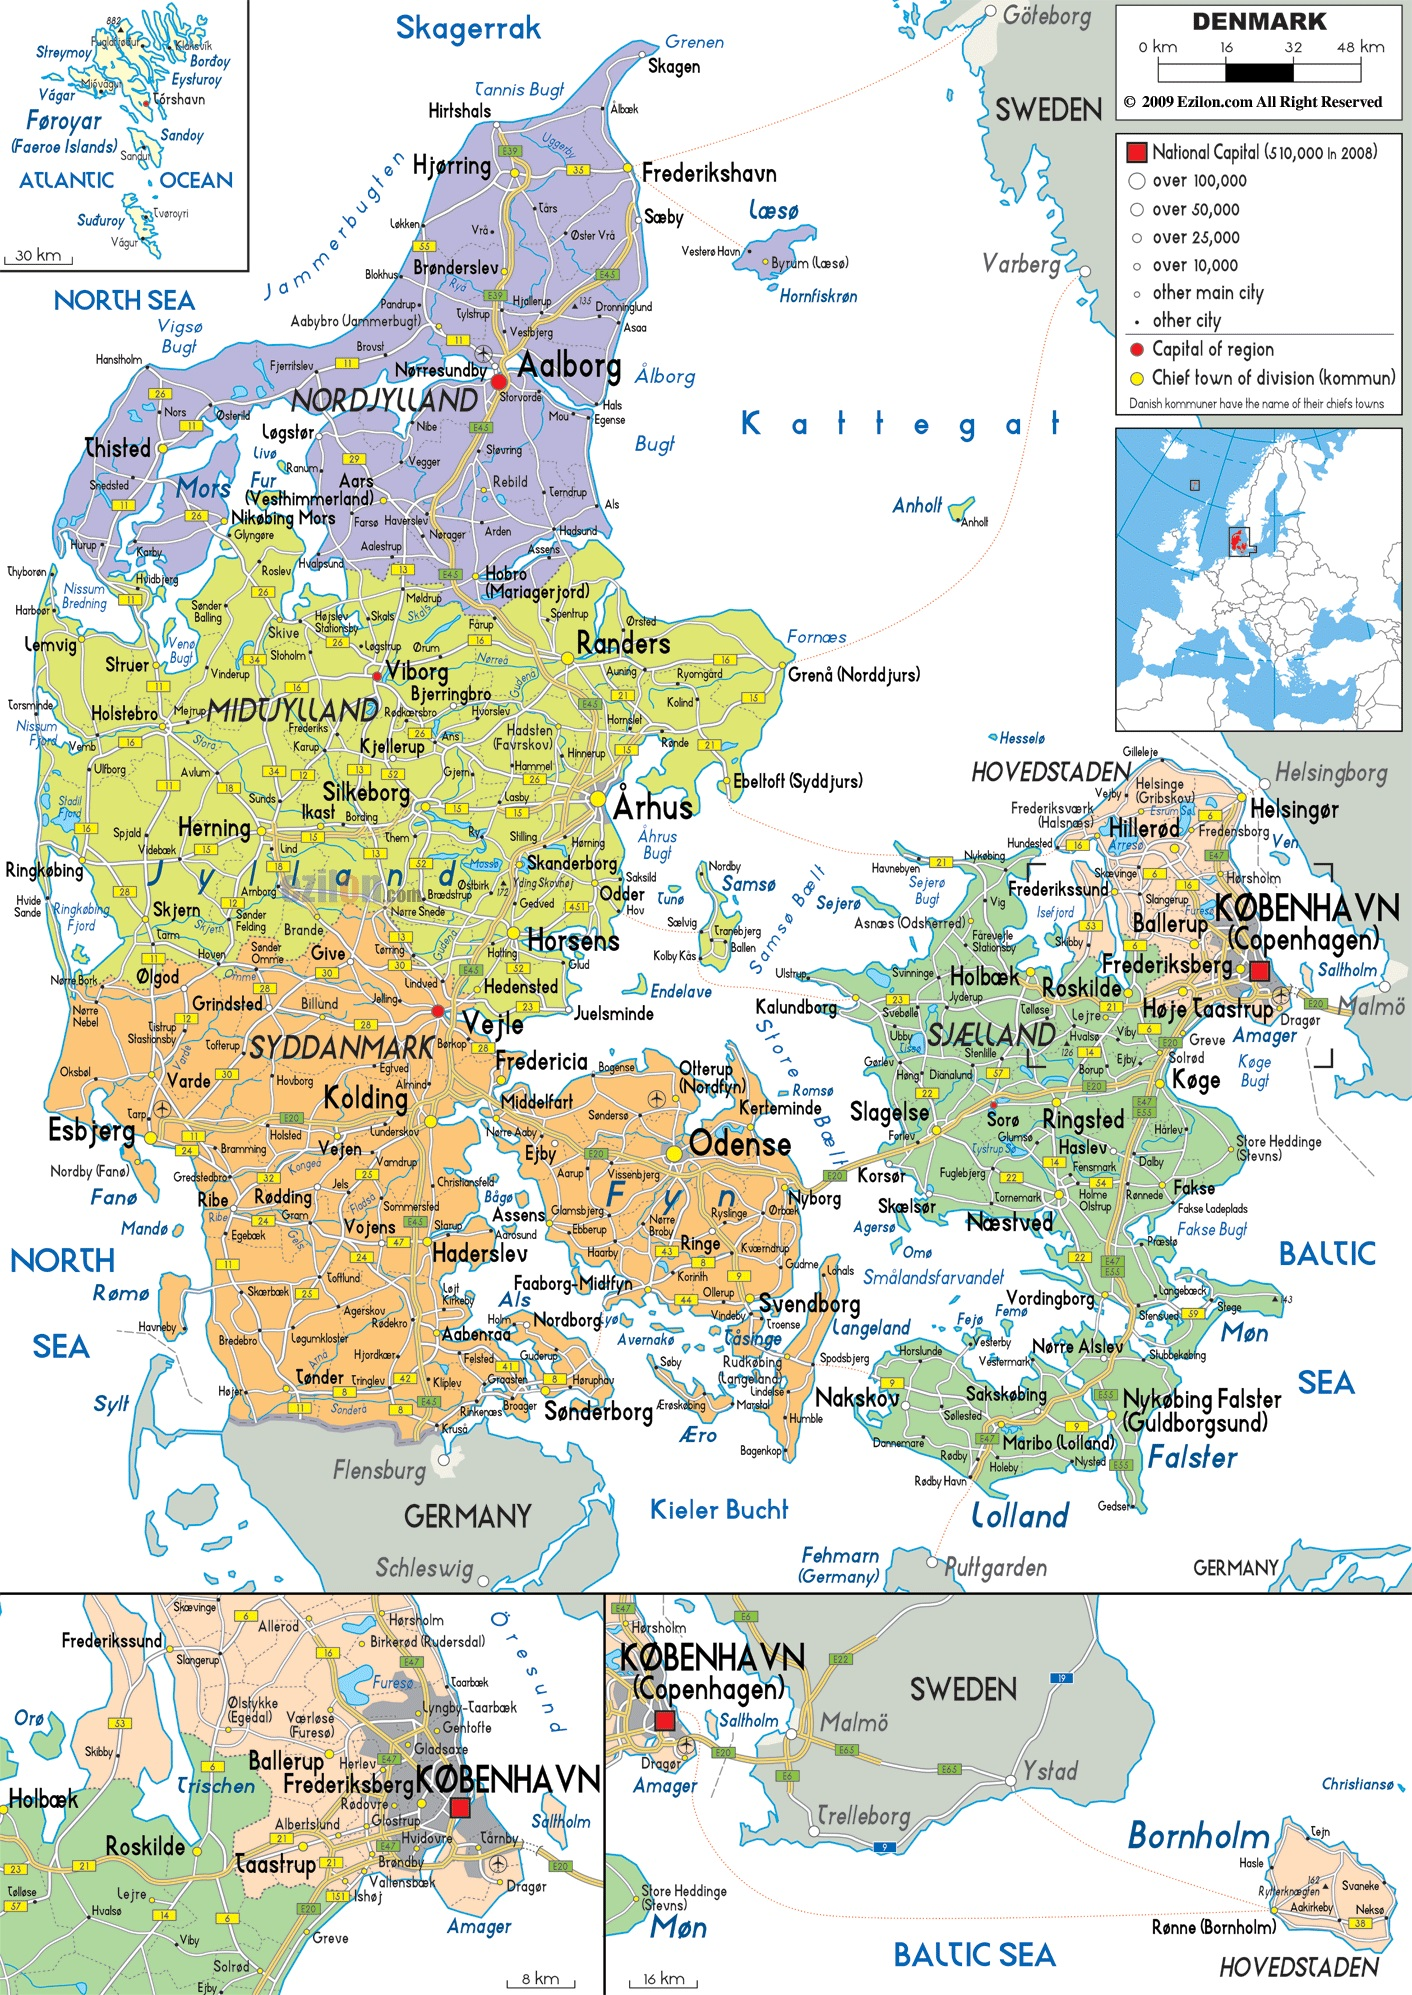 Daniya Na Karte Mira I Evropy Karta Danii Na Russkom Yazyke